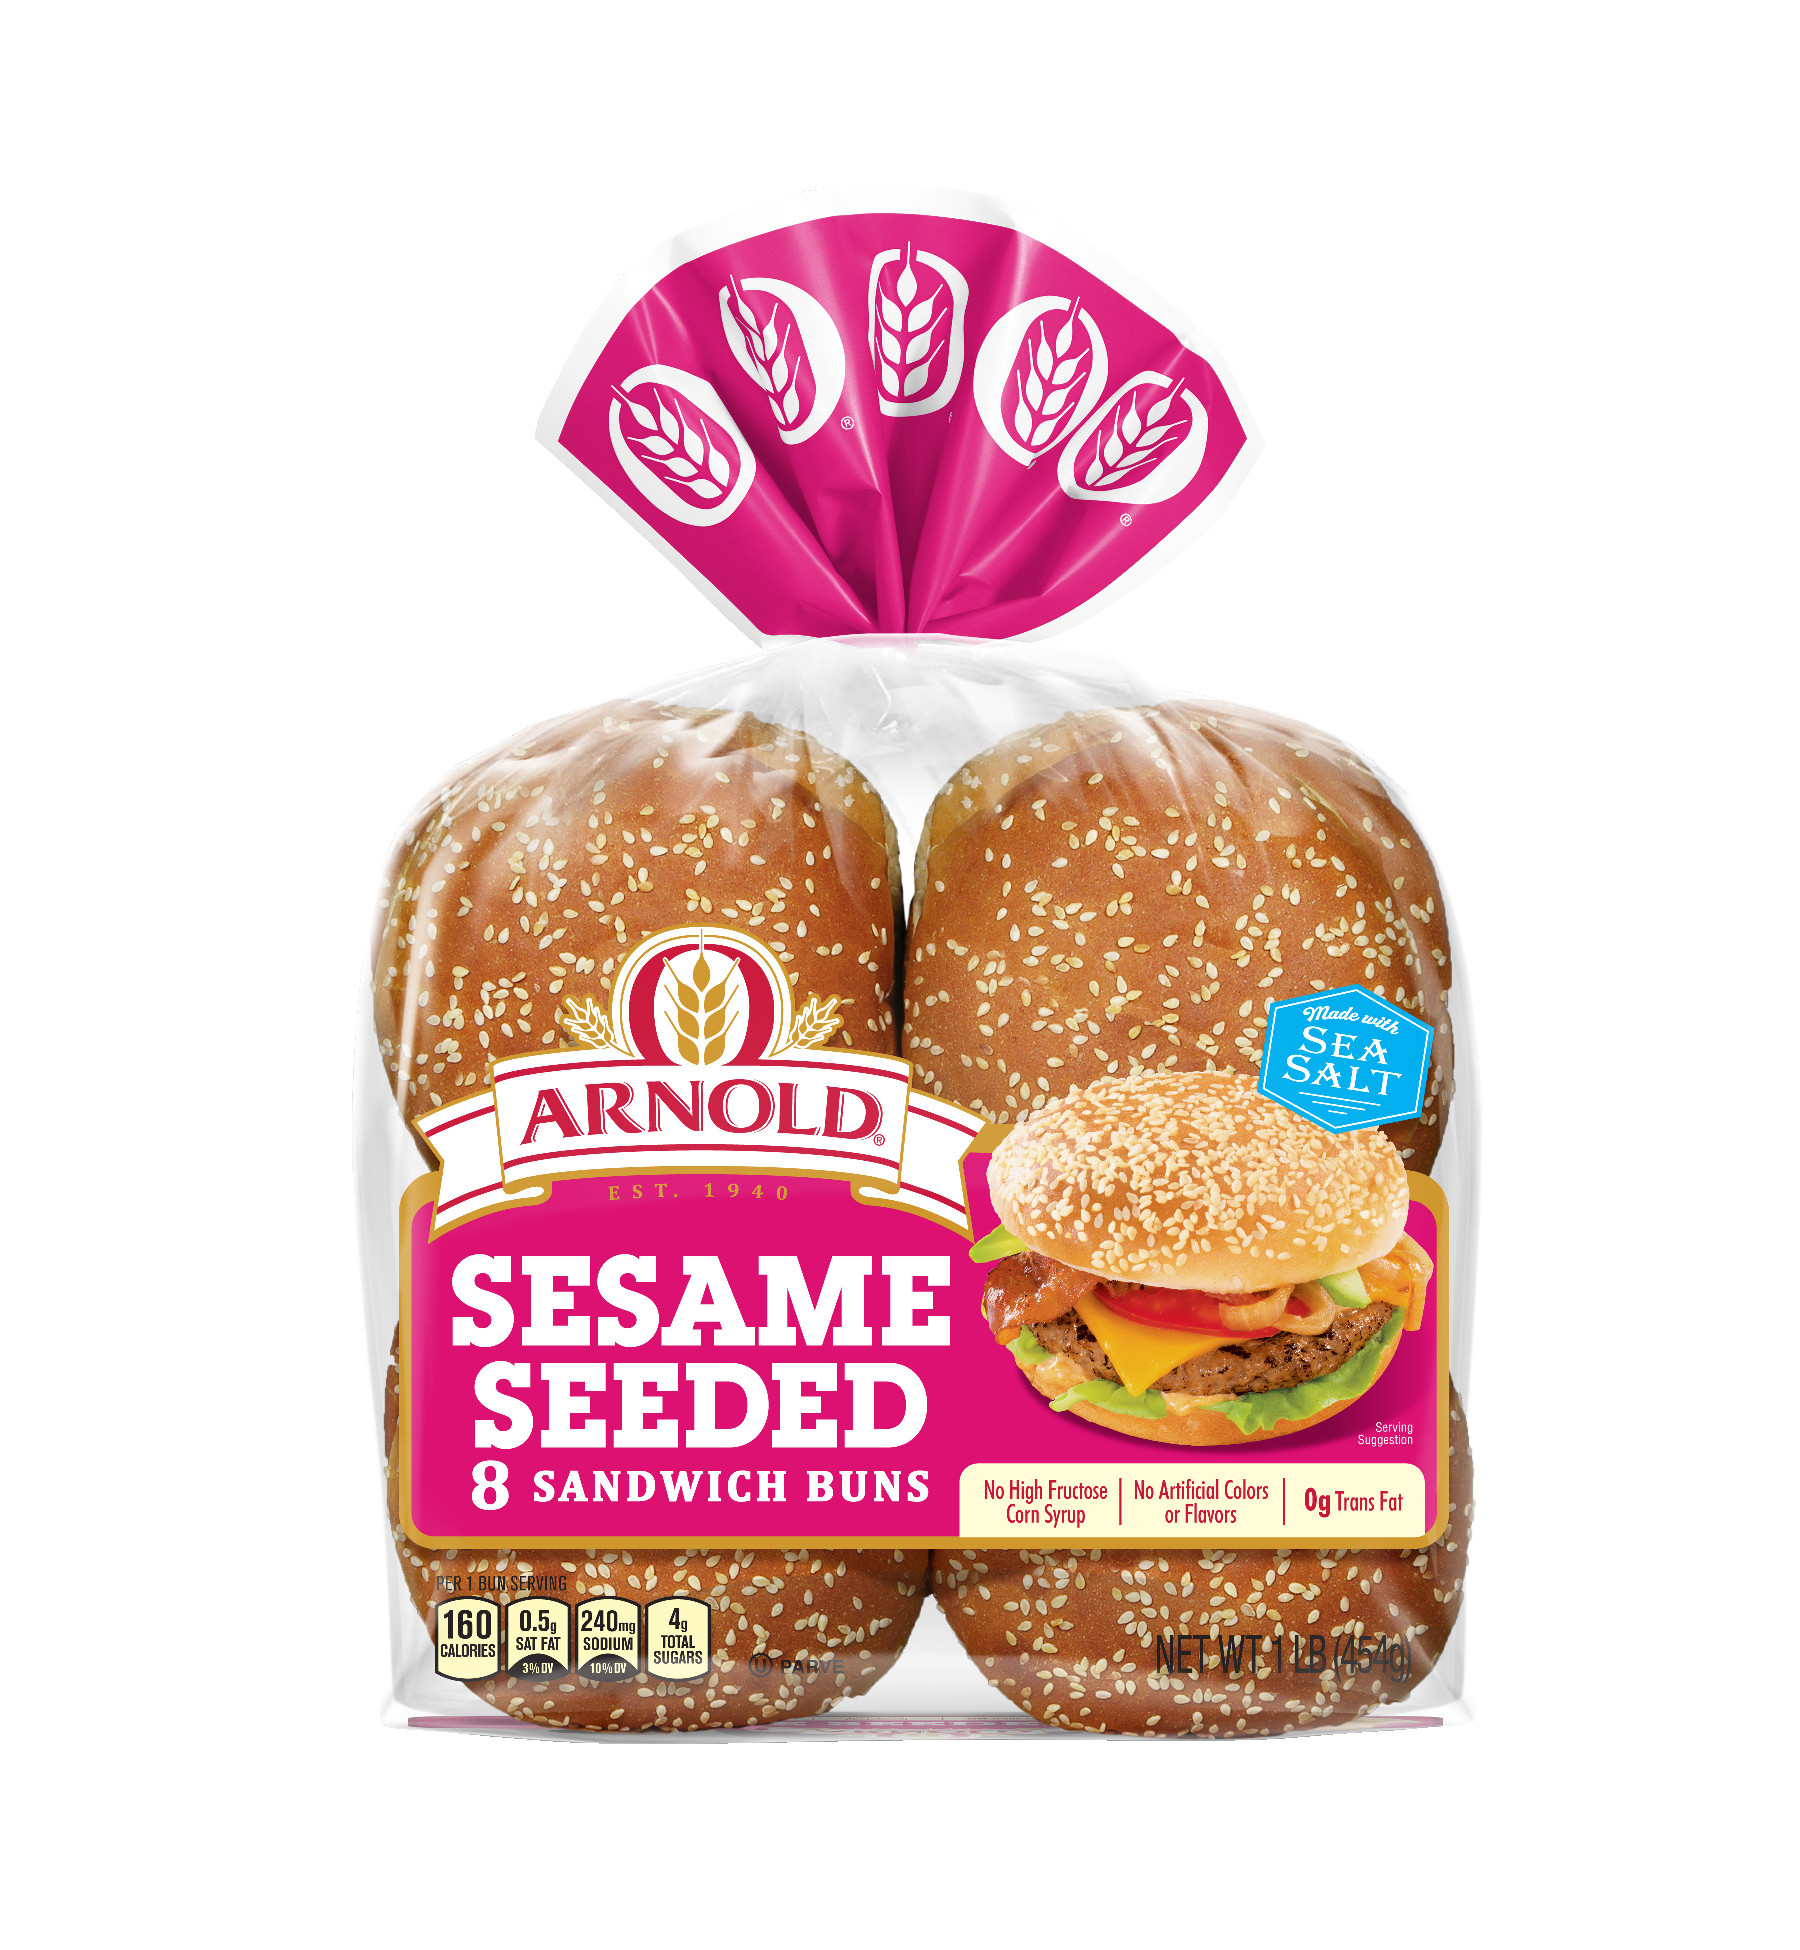 Arnold Sesame Seeded Sandwich Buns, 8 Buns, 16 oz